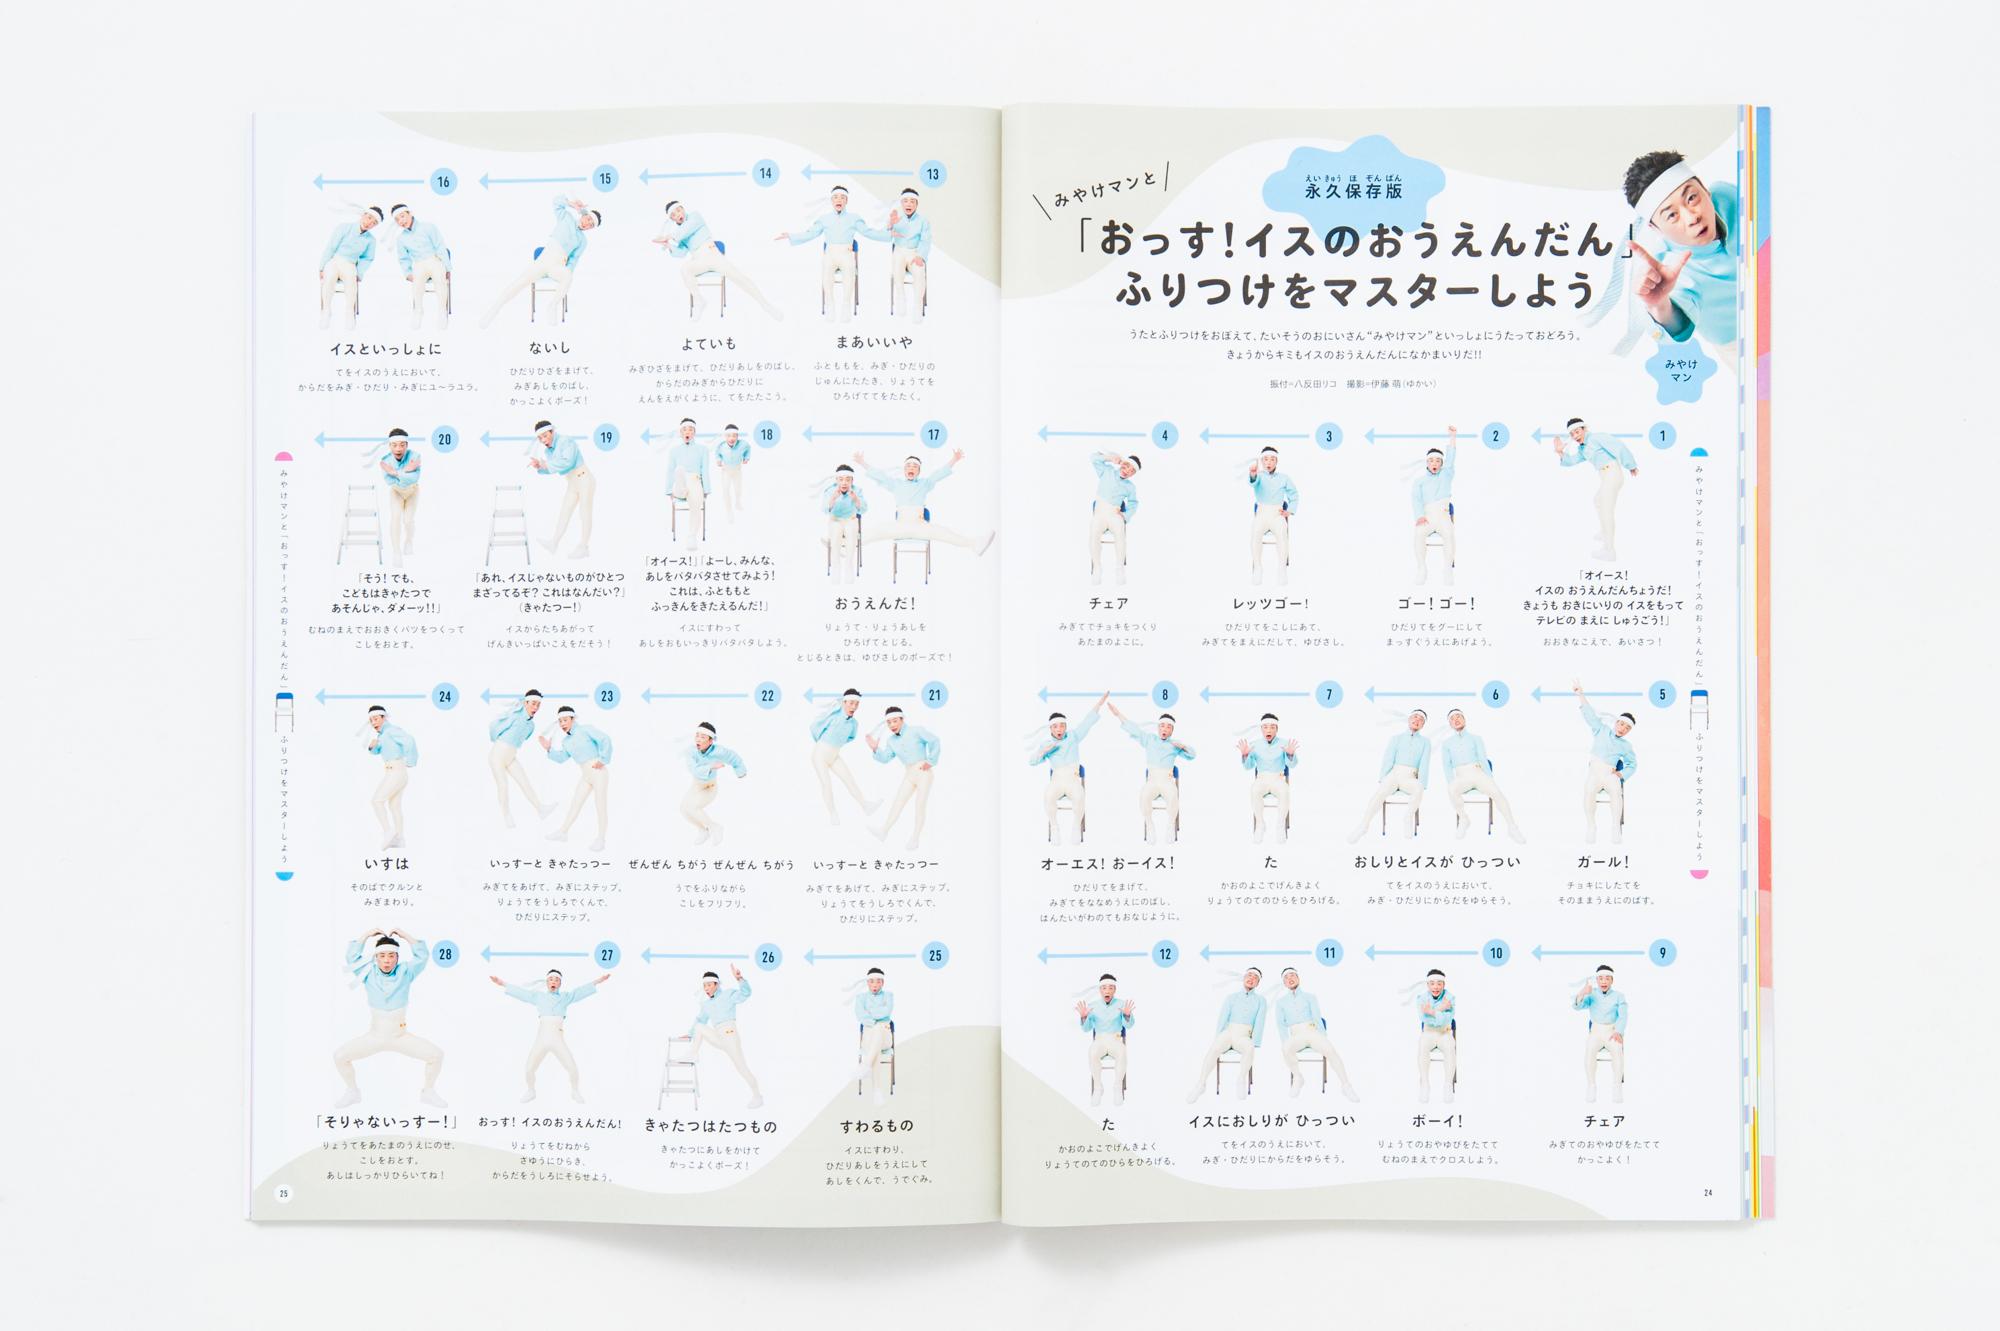 NHK「みいつけた!」SPECIAL BOOK 2017 photo:ITO Moe